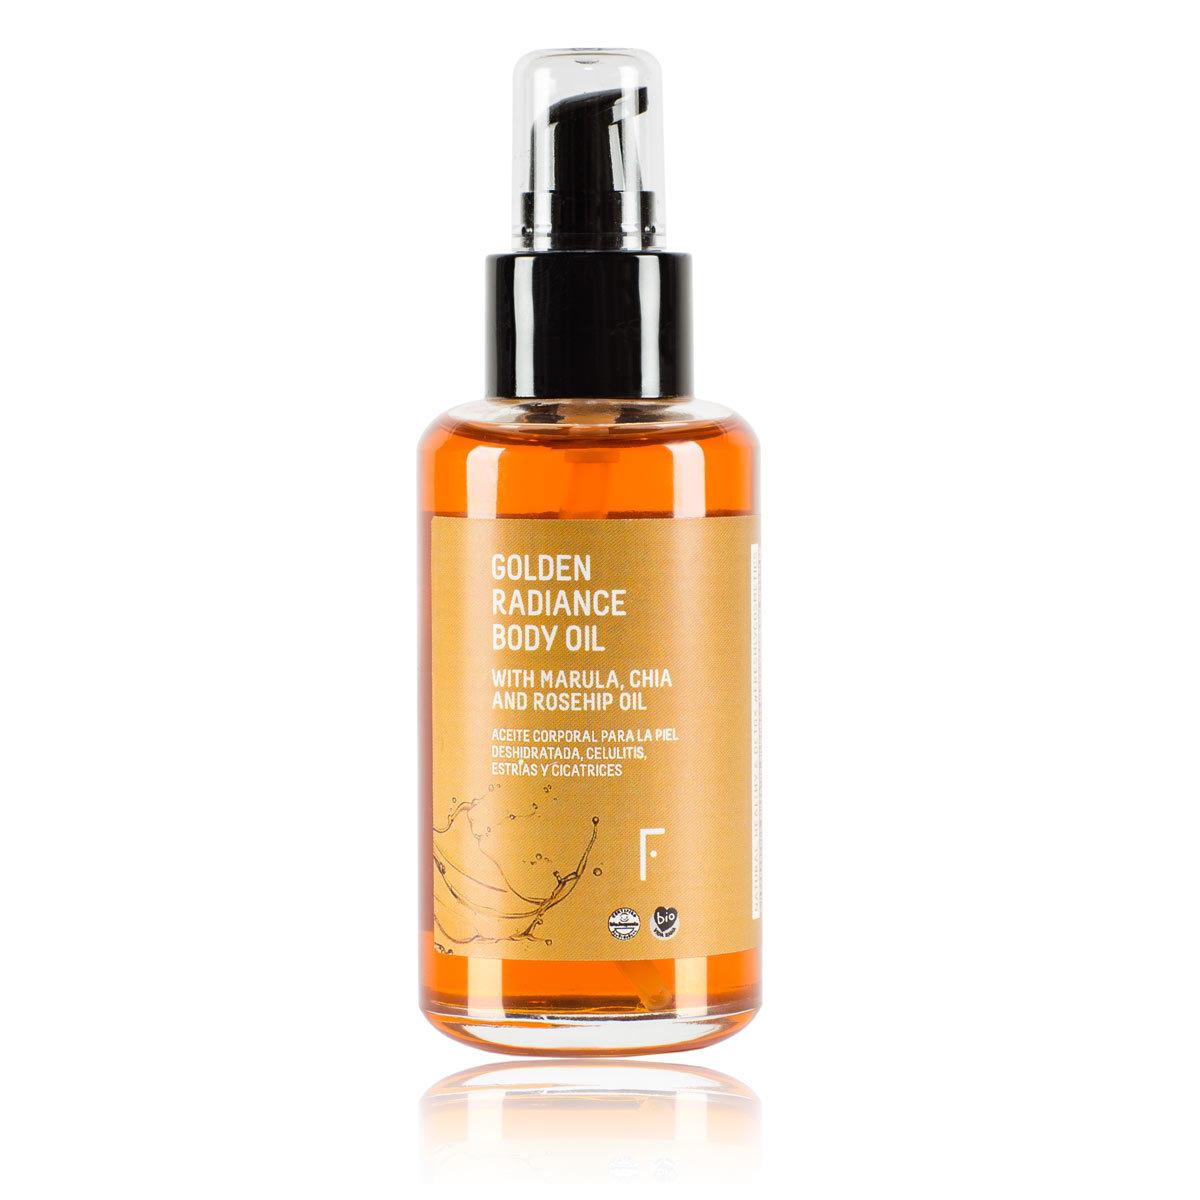 Golden Radiance Body Oil, Freshly Cosmetics.